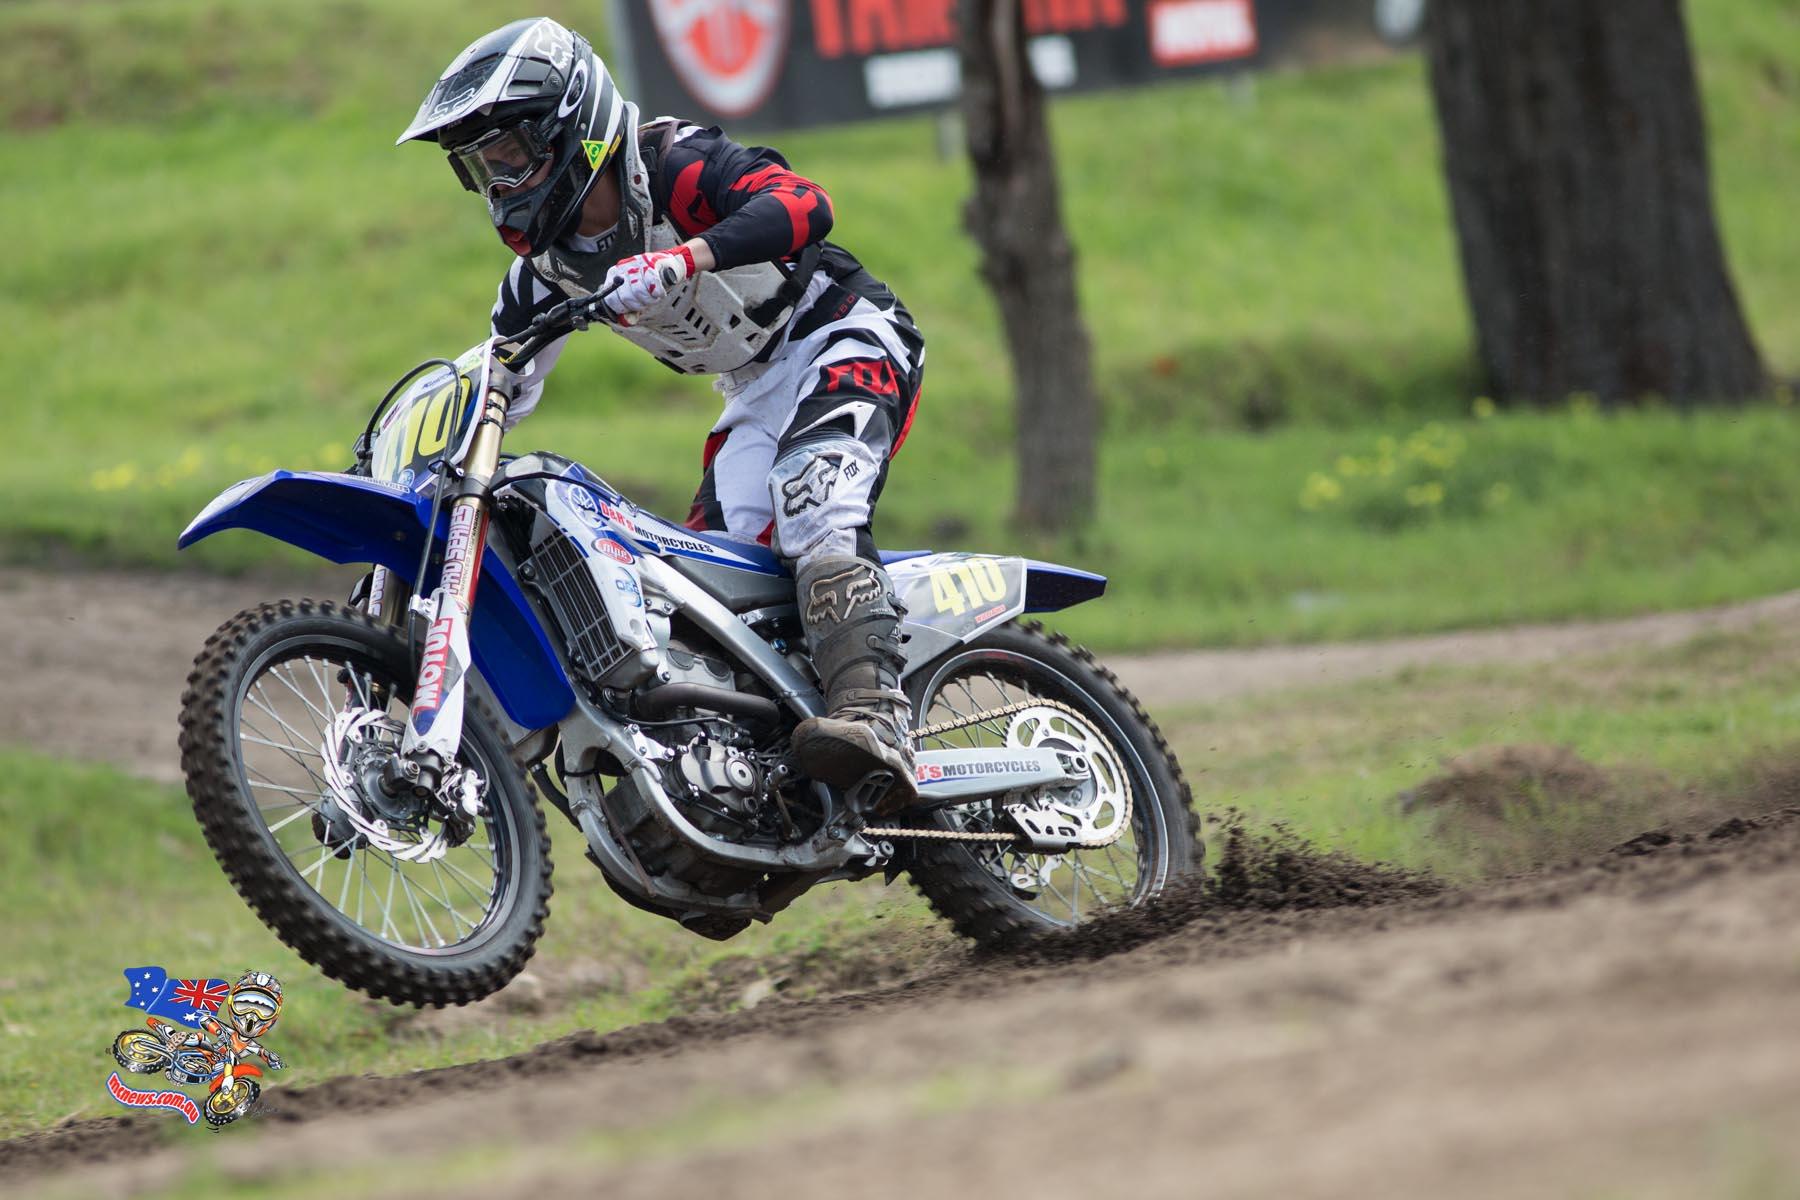 2015 KTM Australian Motocross Championship